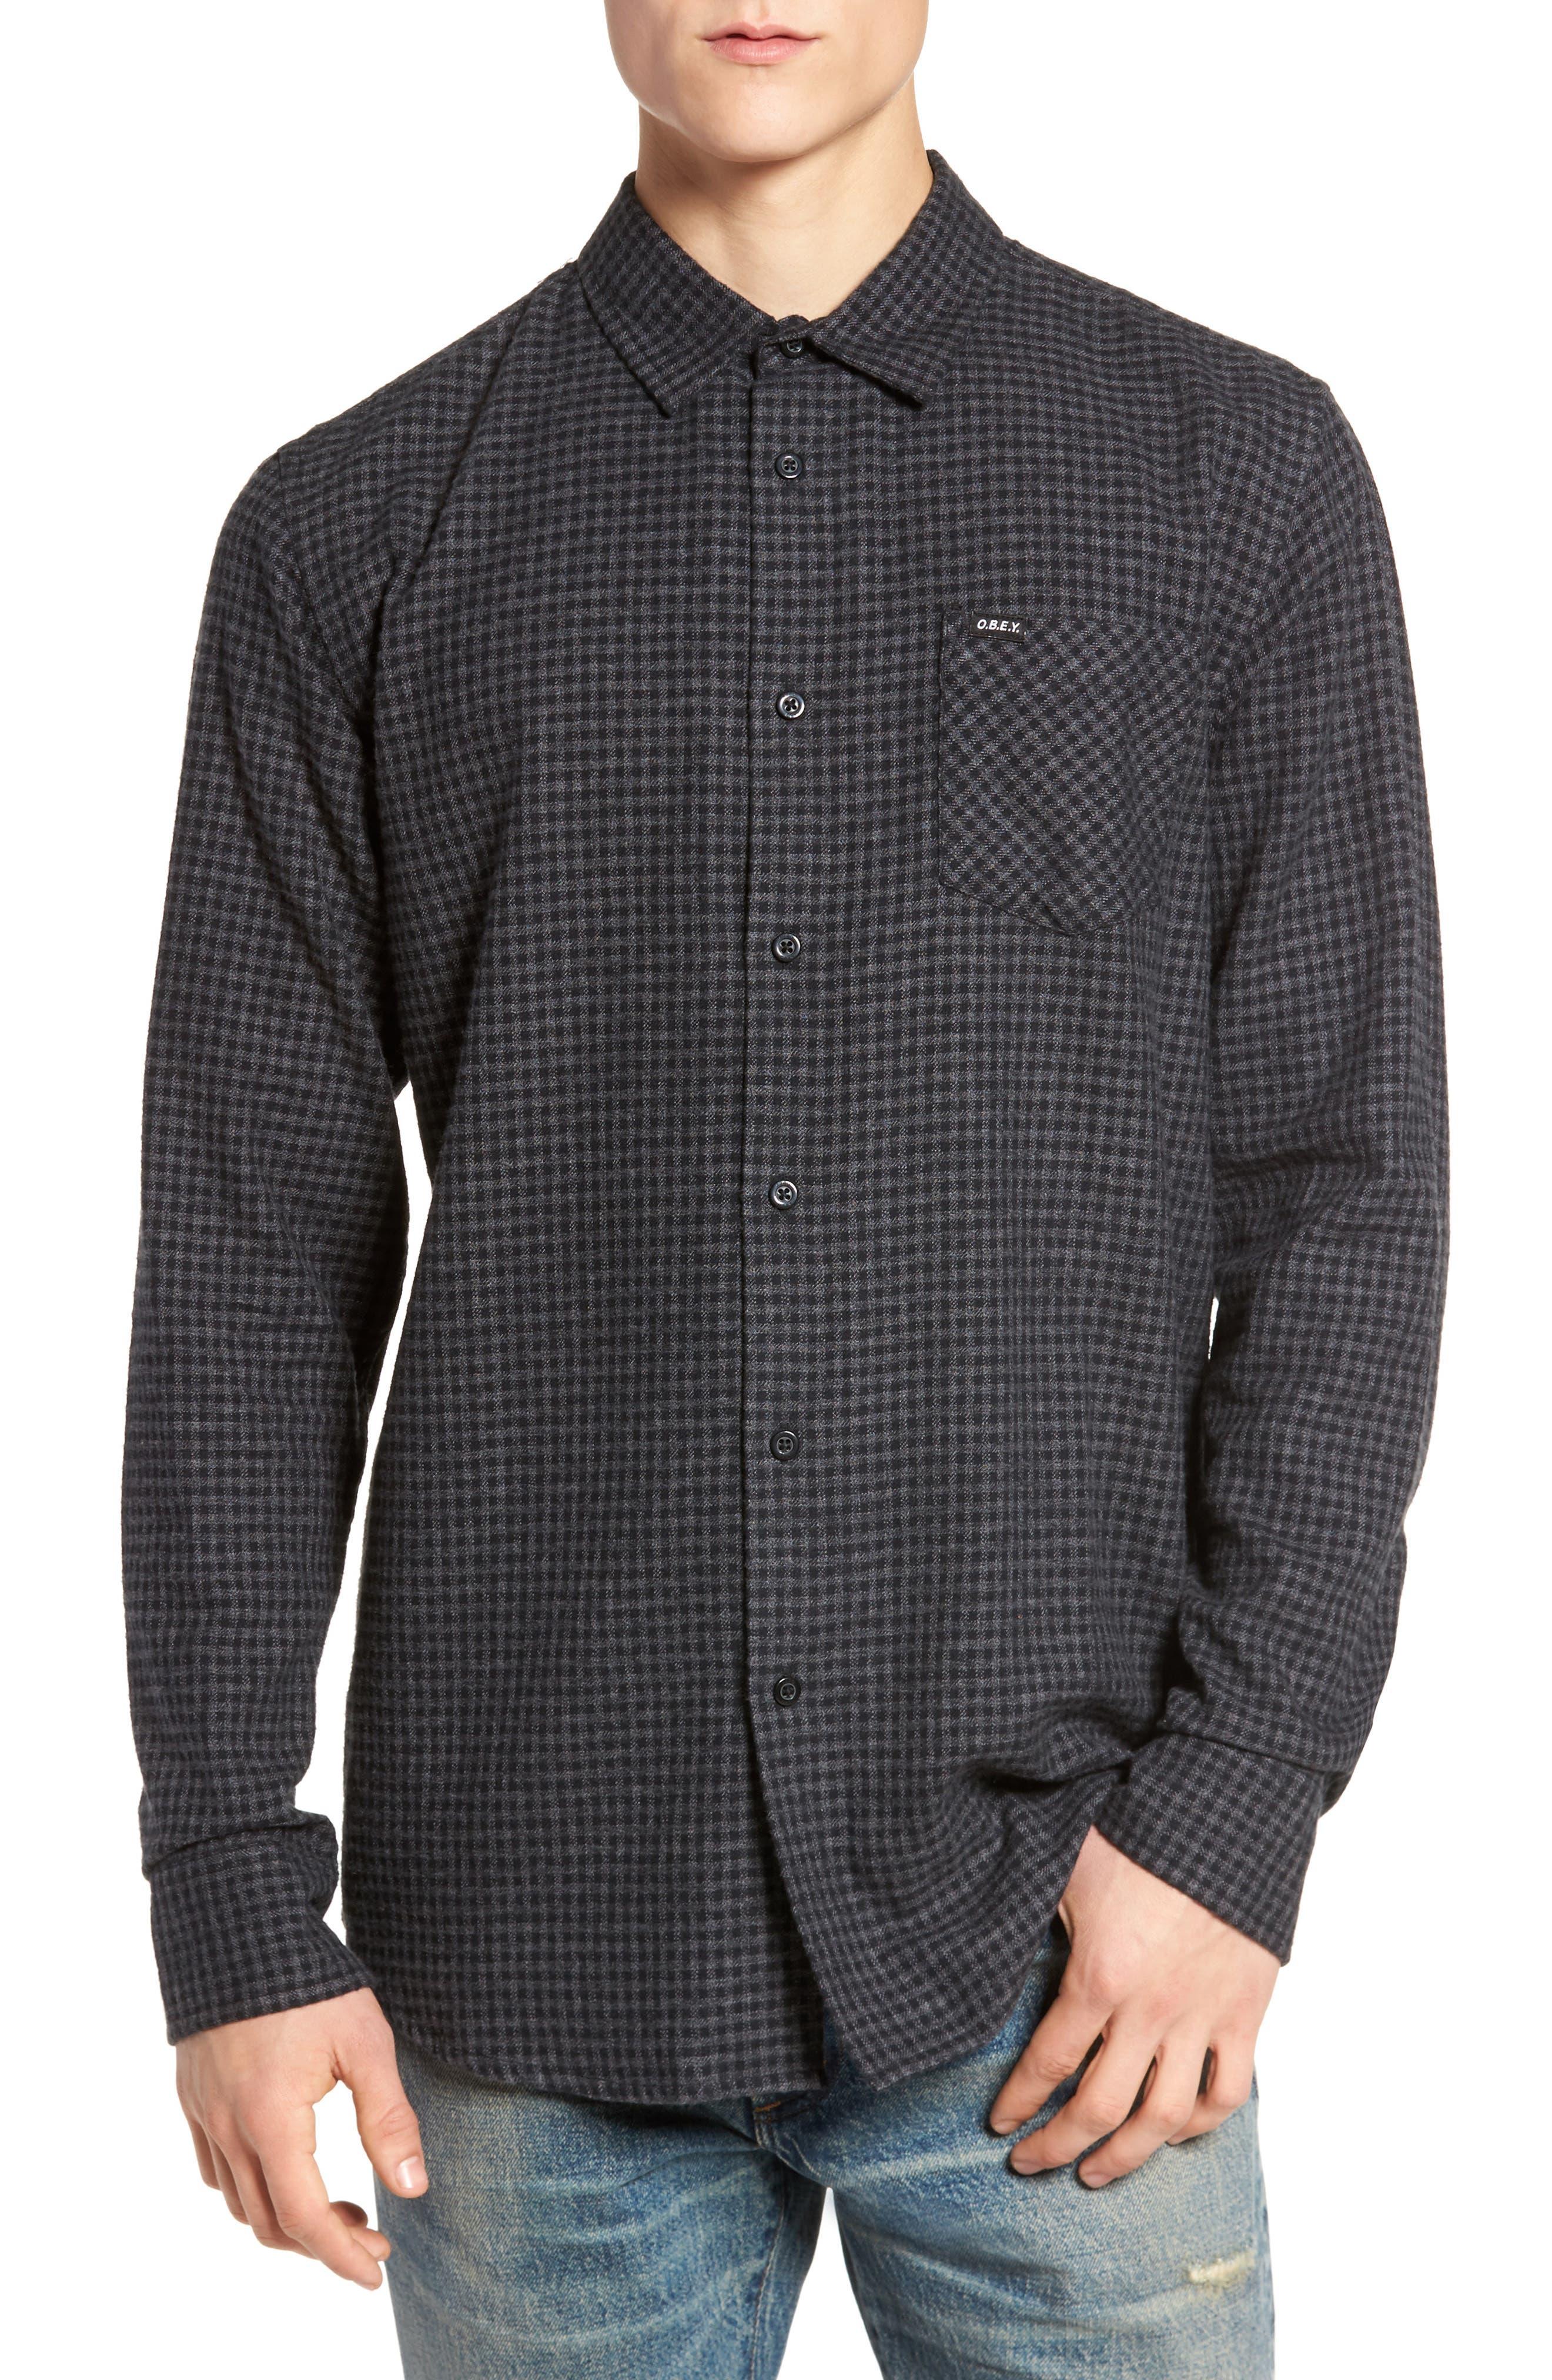 Outsider Microcheck Sport Shirt,                             Main thumbnail 1, color,                             Black Multi